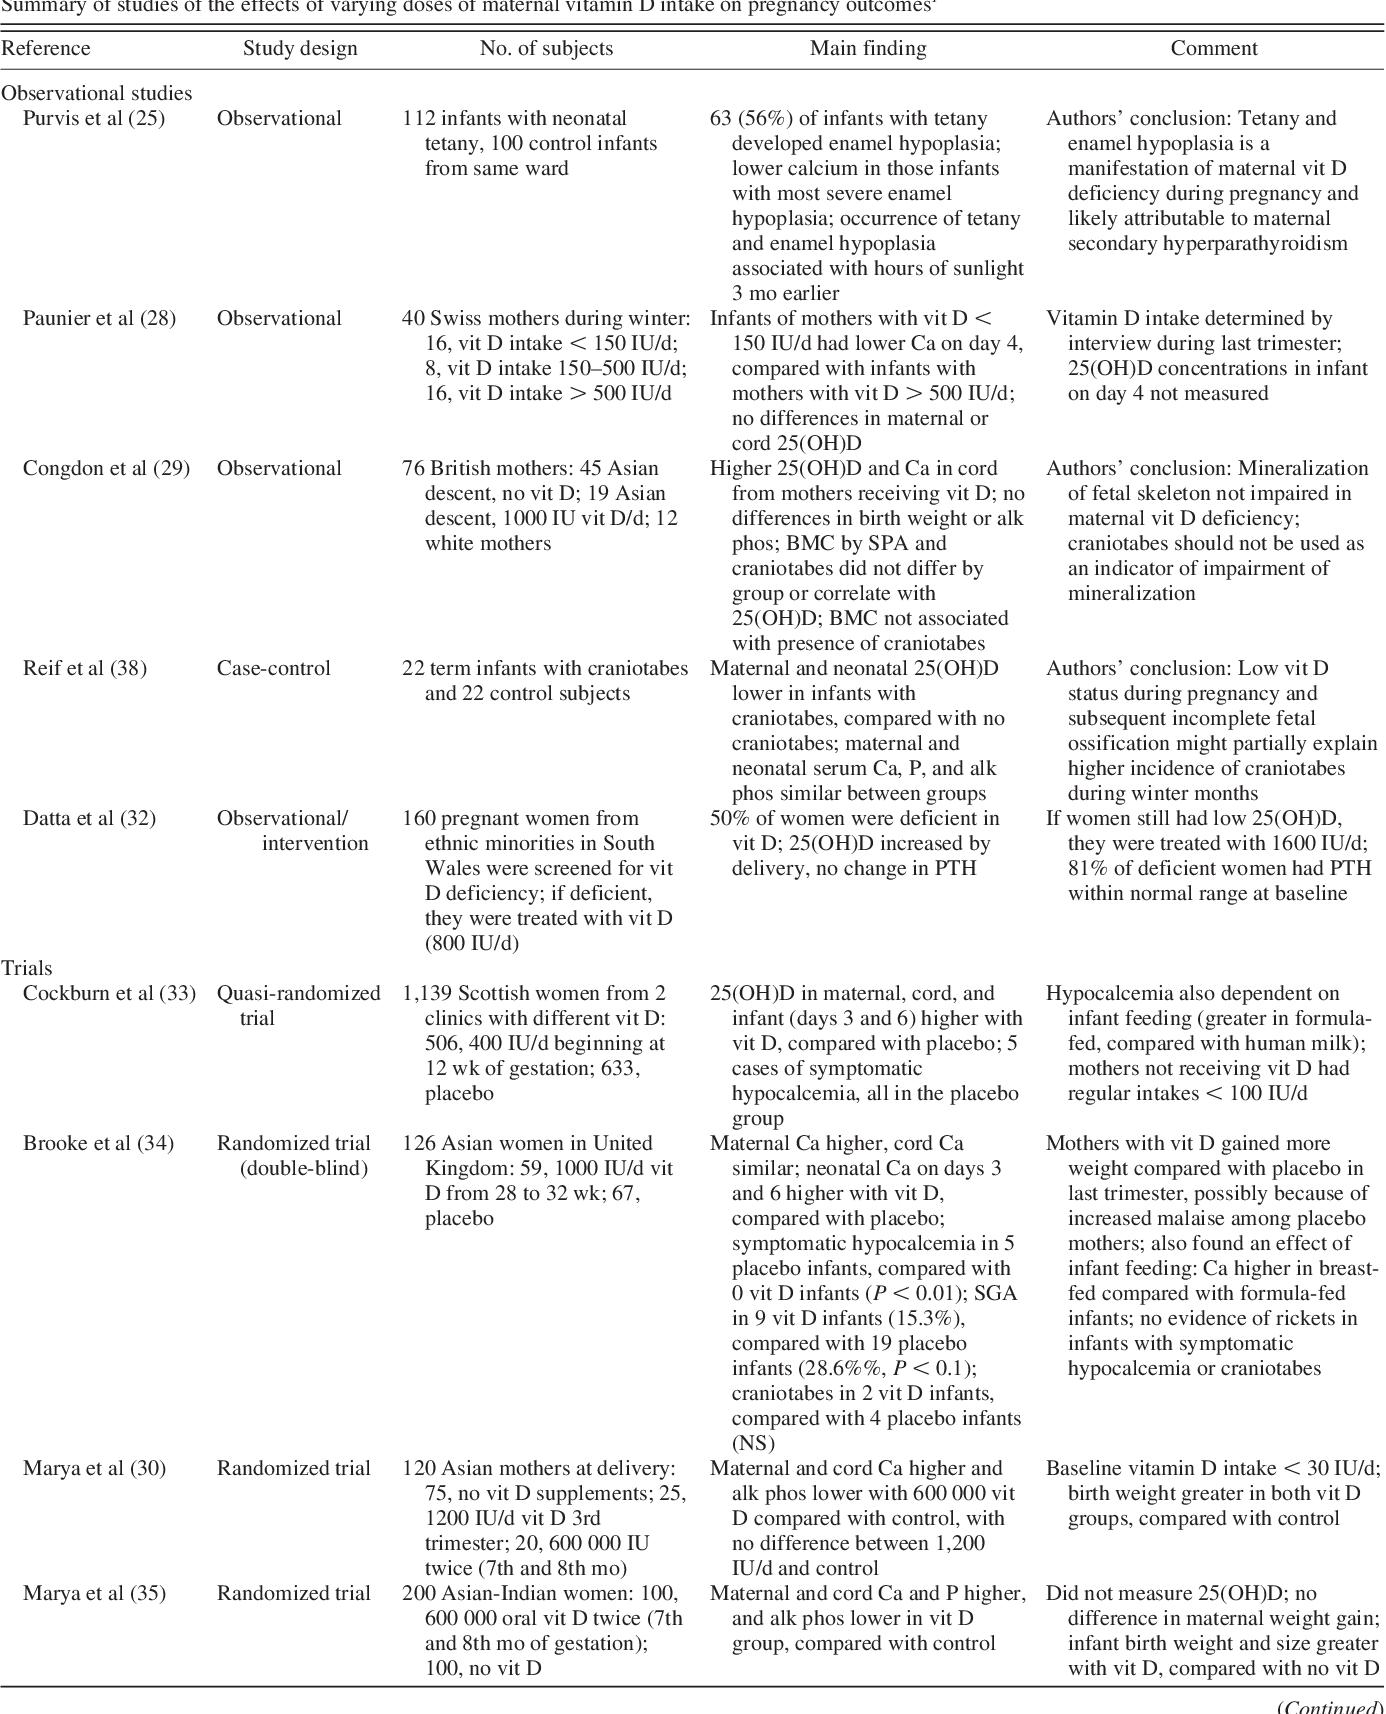 Vitamin D Deficiency During Pregnancy >> Pdf Vitamin D Requirements During Pregnancy 1 4 Semantic Scholar